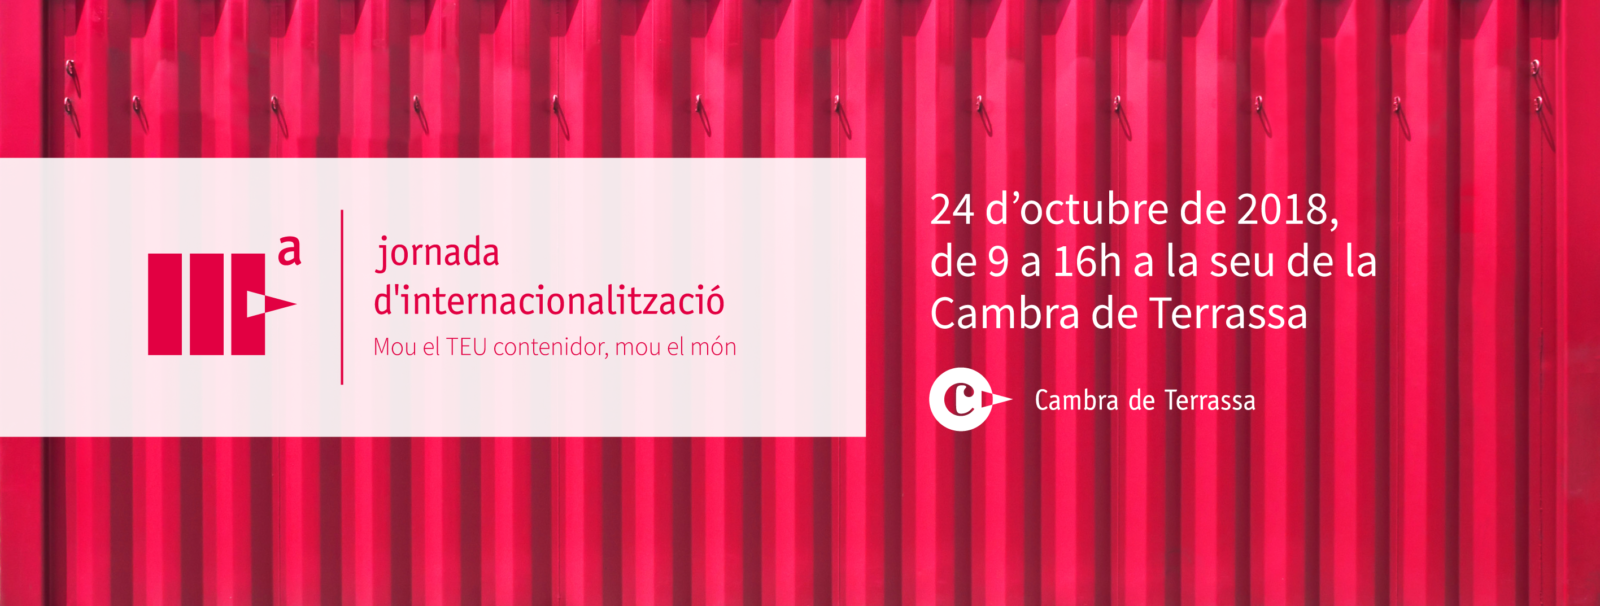 Programa_jornada_ internacionalitzacio¦ü_CAT_DIGITAL-01